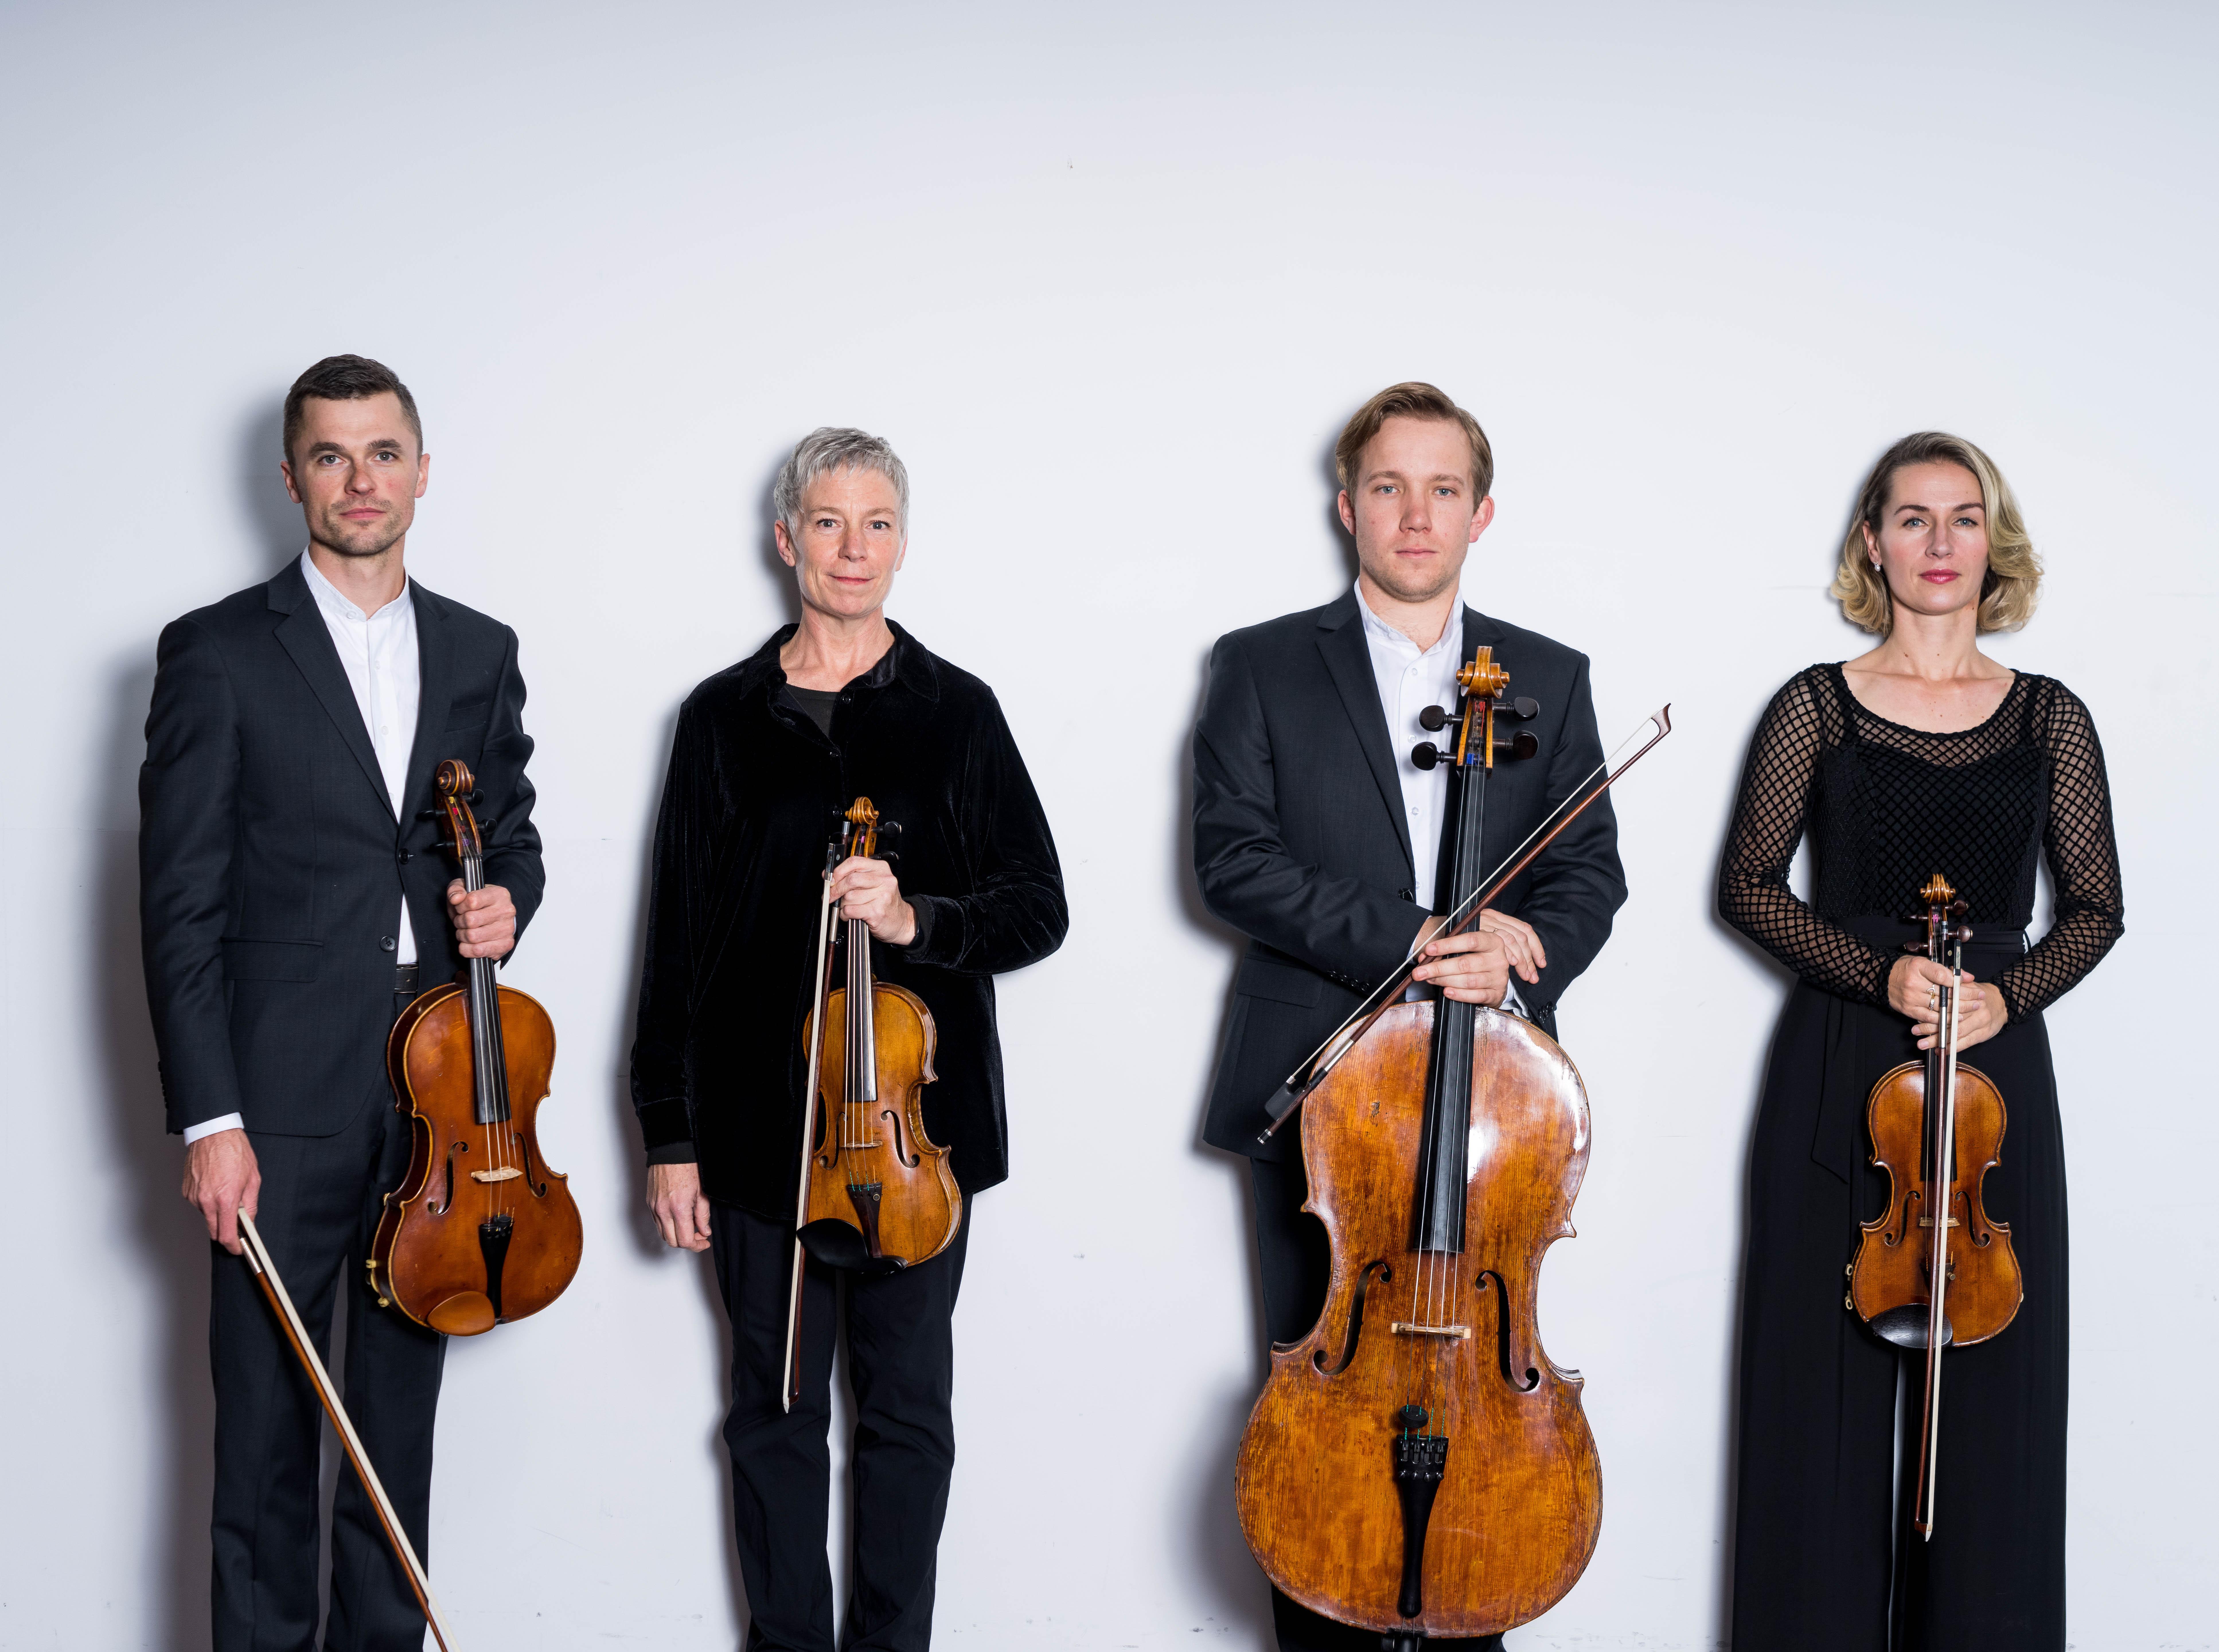 Tasmanian String Quartet musicians, L to R: Doug Coghill (viola); Jennifer Owen (violin); Jonathan Békés (cello) and Emma McGrath (violin).